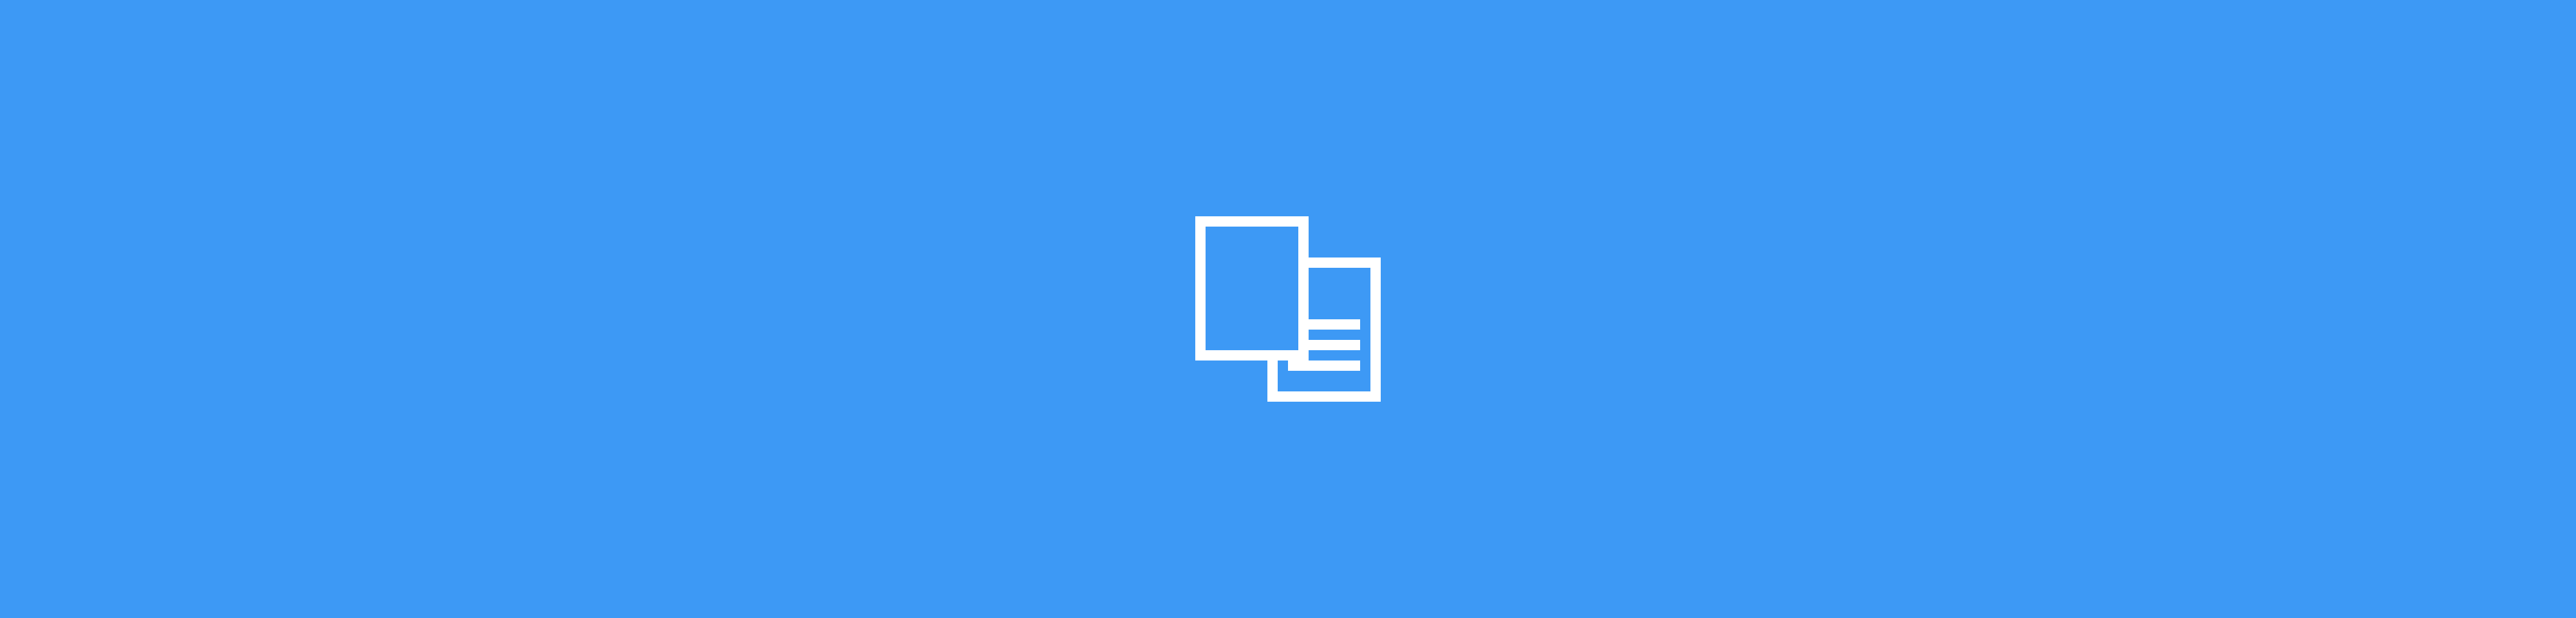 free online jpg to word converter